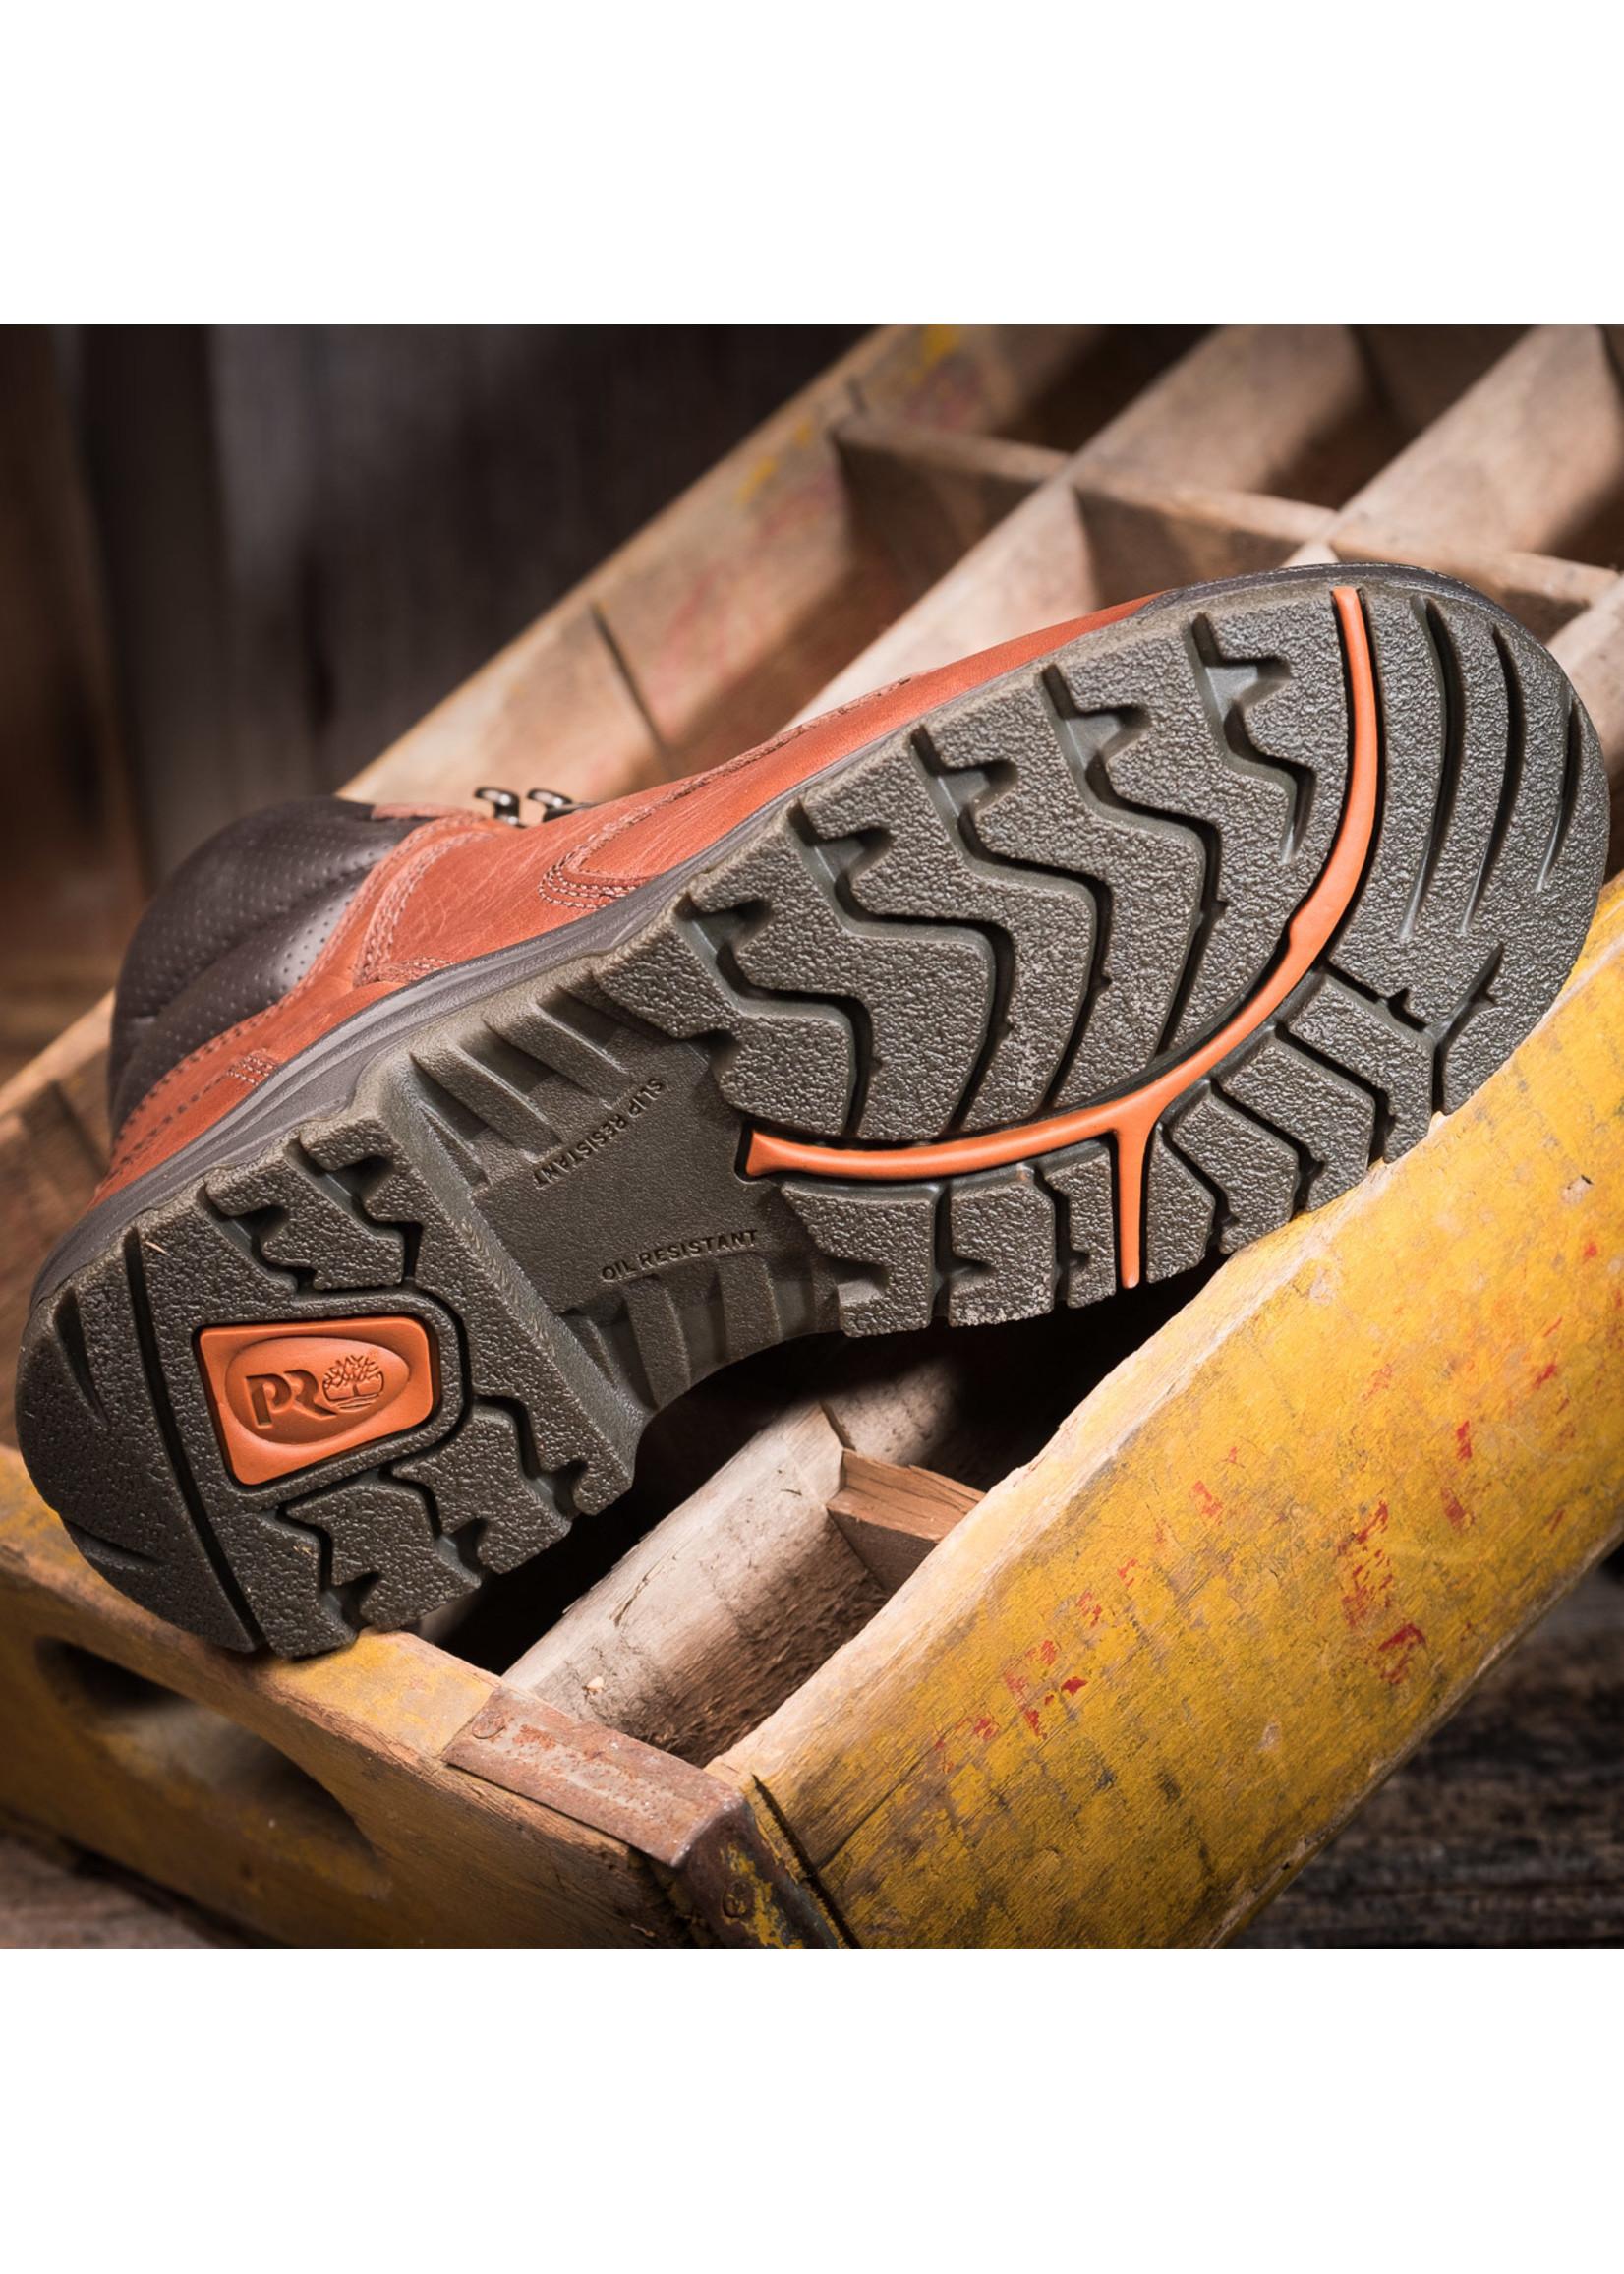 "Timberland Pro Titan 55398 Women's 6"" Soft Toe Work Boot"